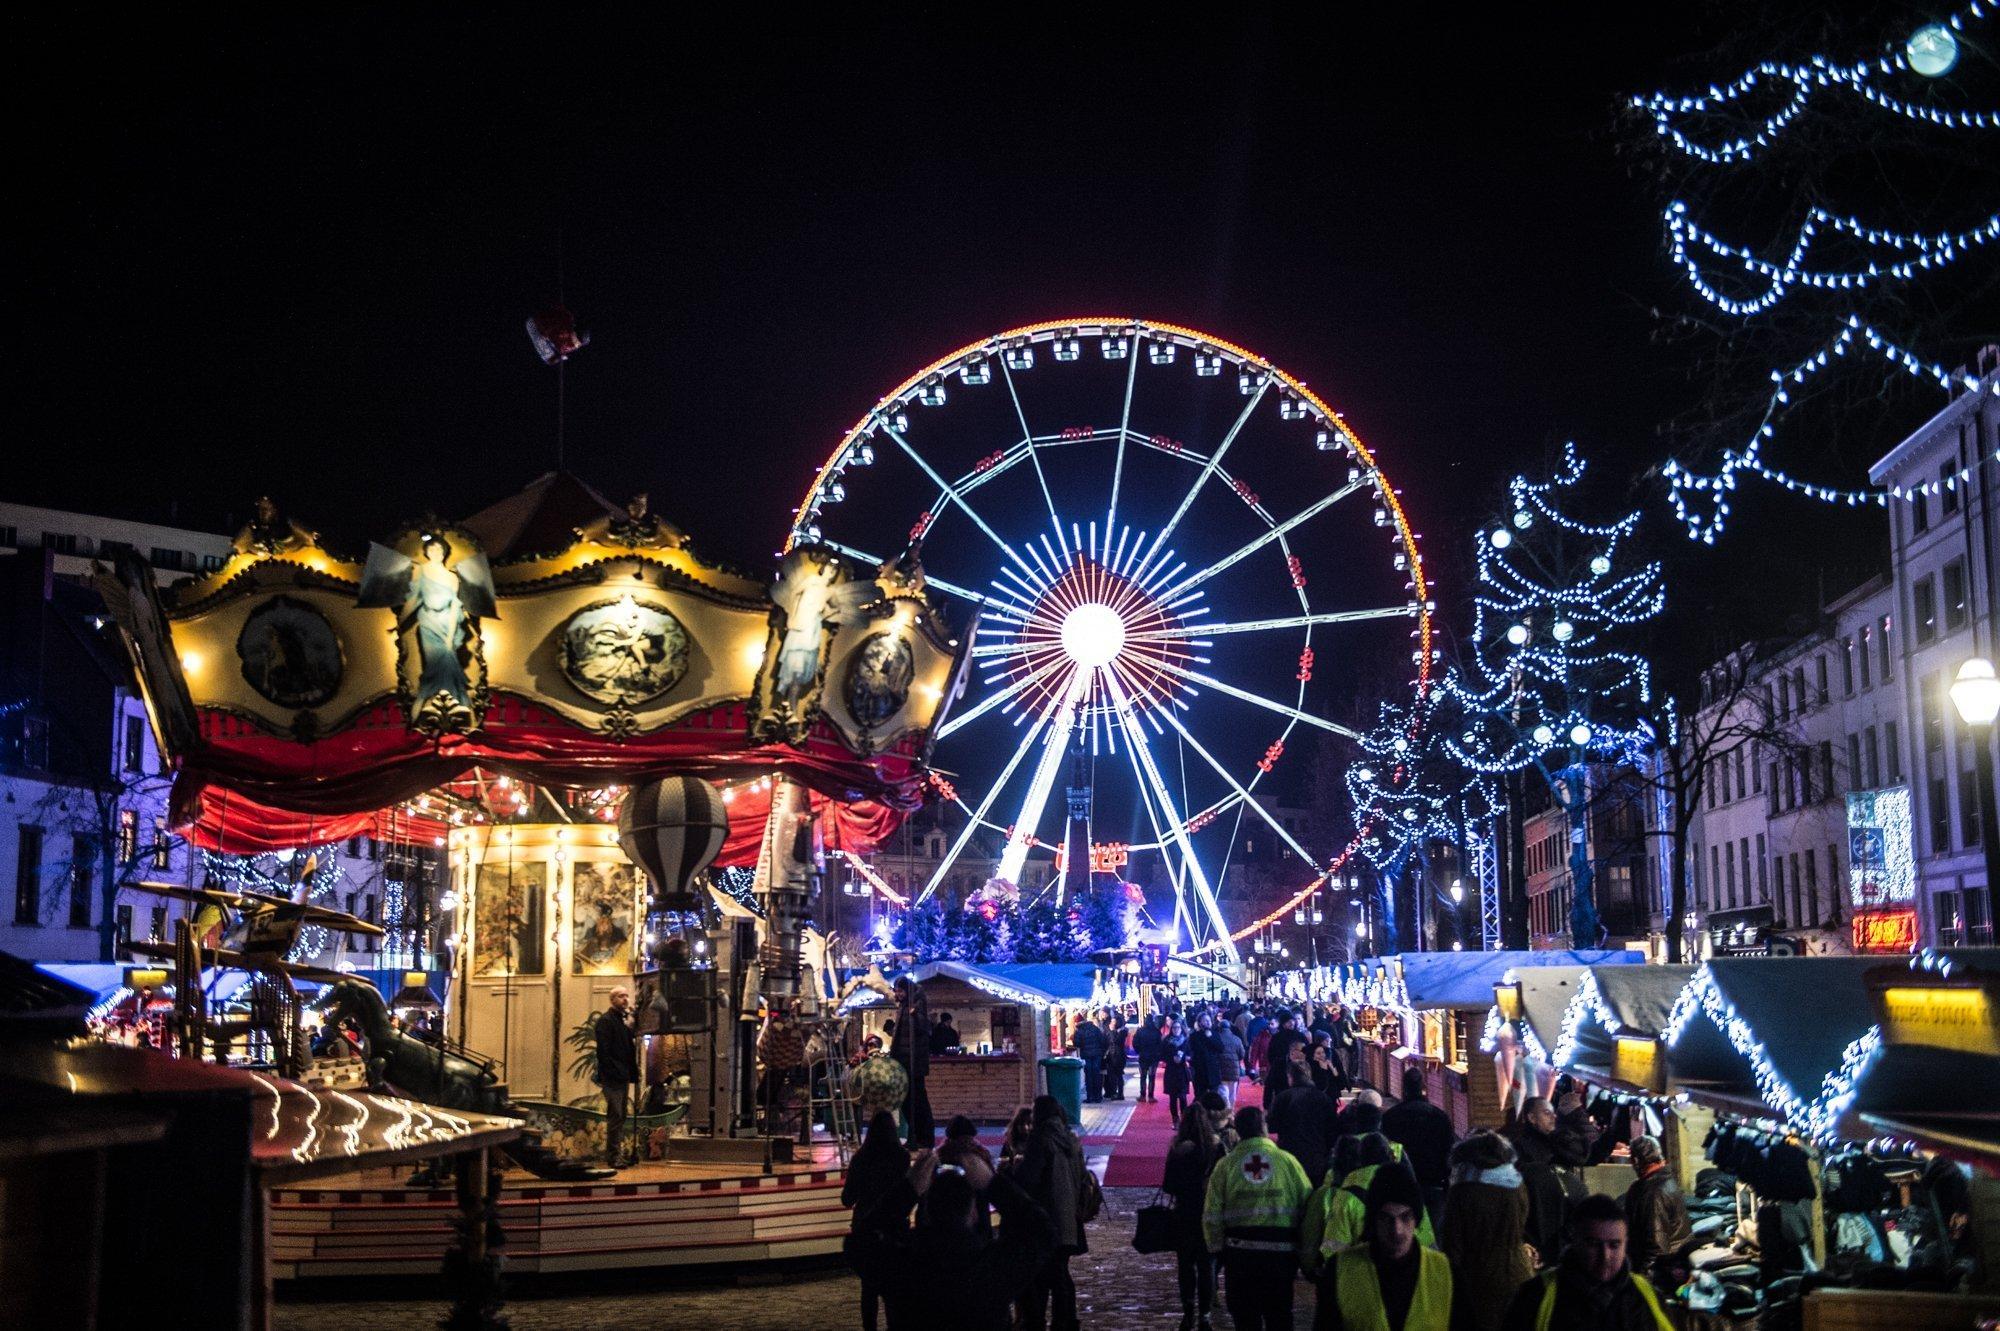 Mercado de navidad e Bruselas